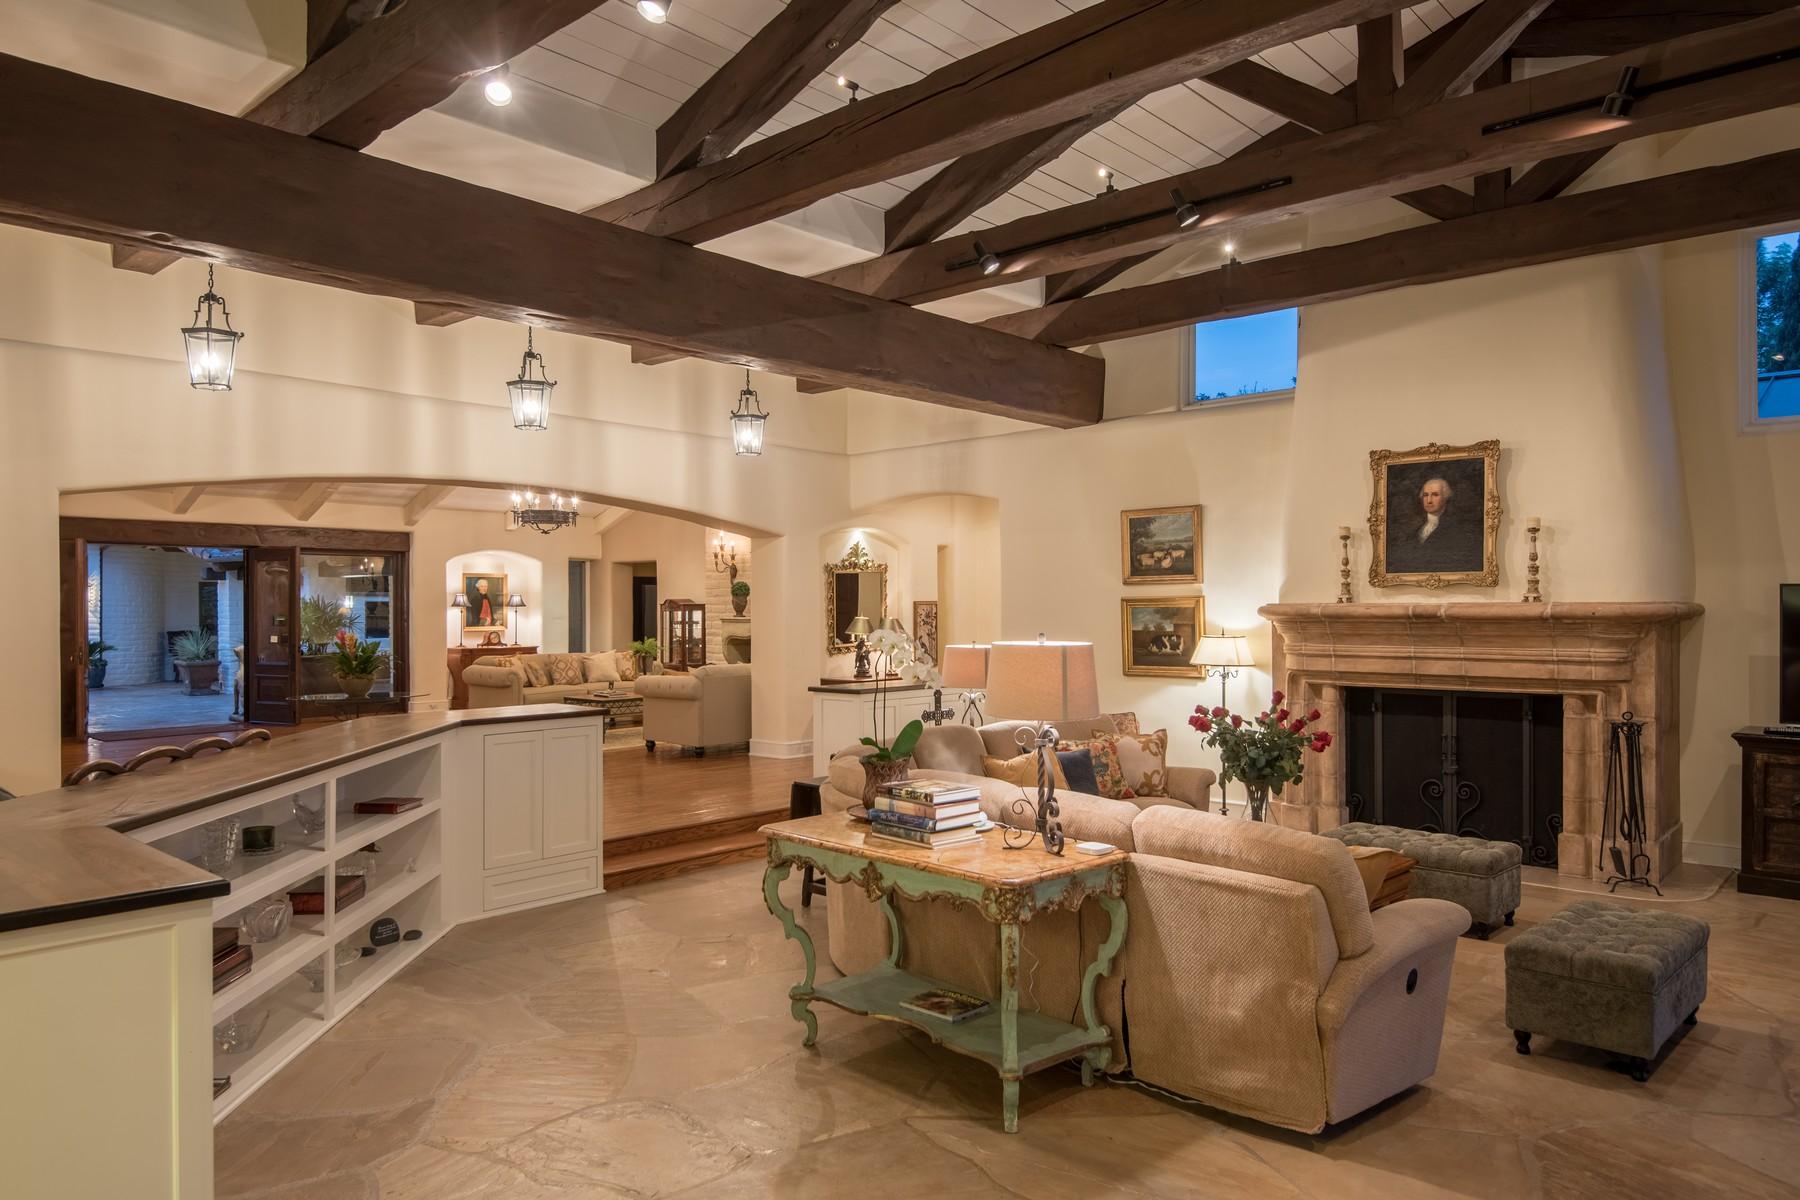 Additional photo for property listing at 6083 Mimulus  Rancho Santa Fe, Калифорния 92067 Соединенные Штаты